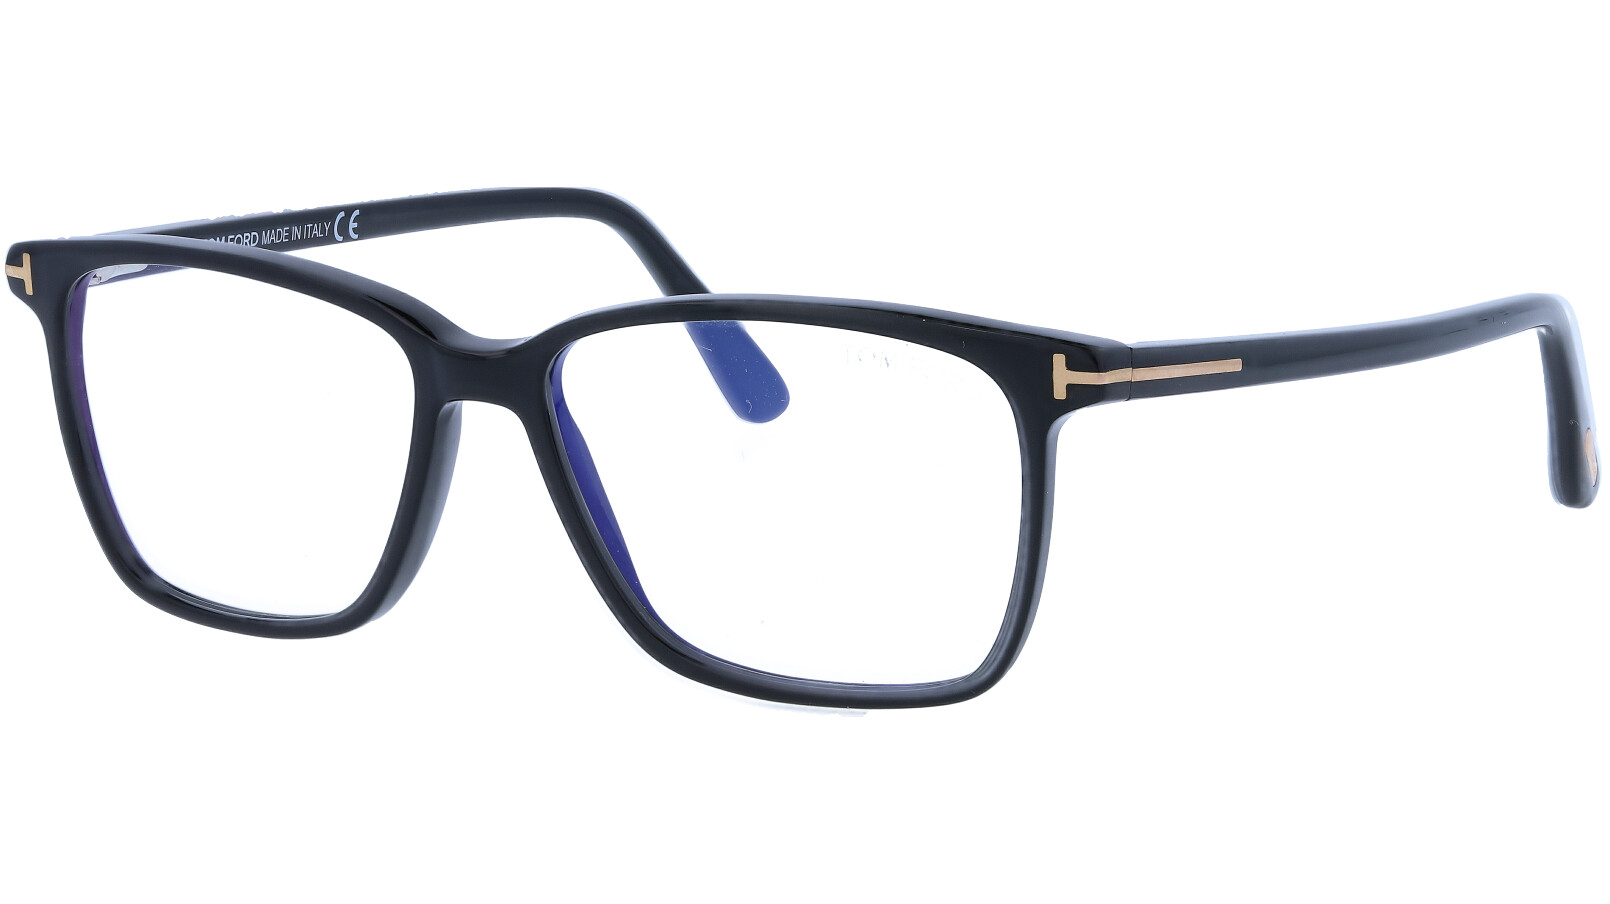 Tom Ford TF5478-B 001 53 Black Glasses